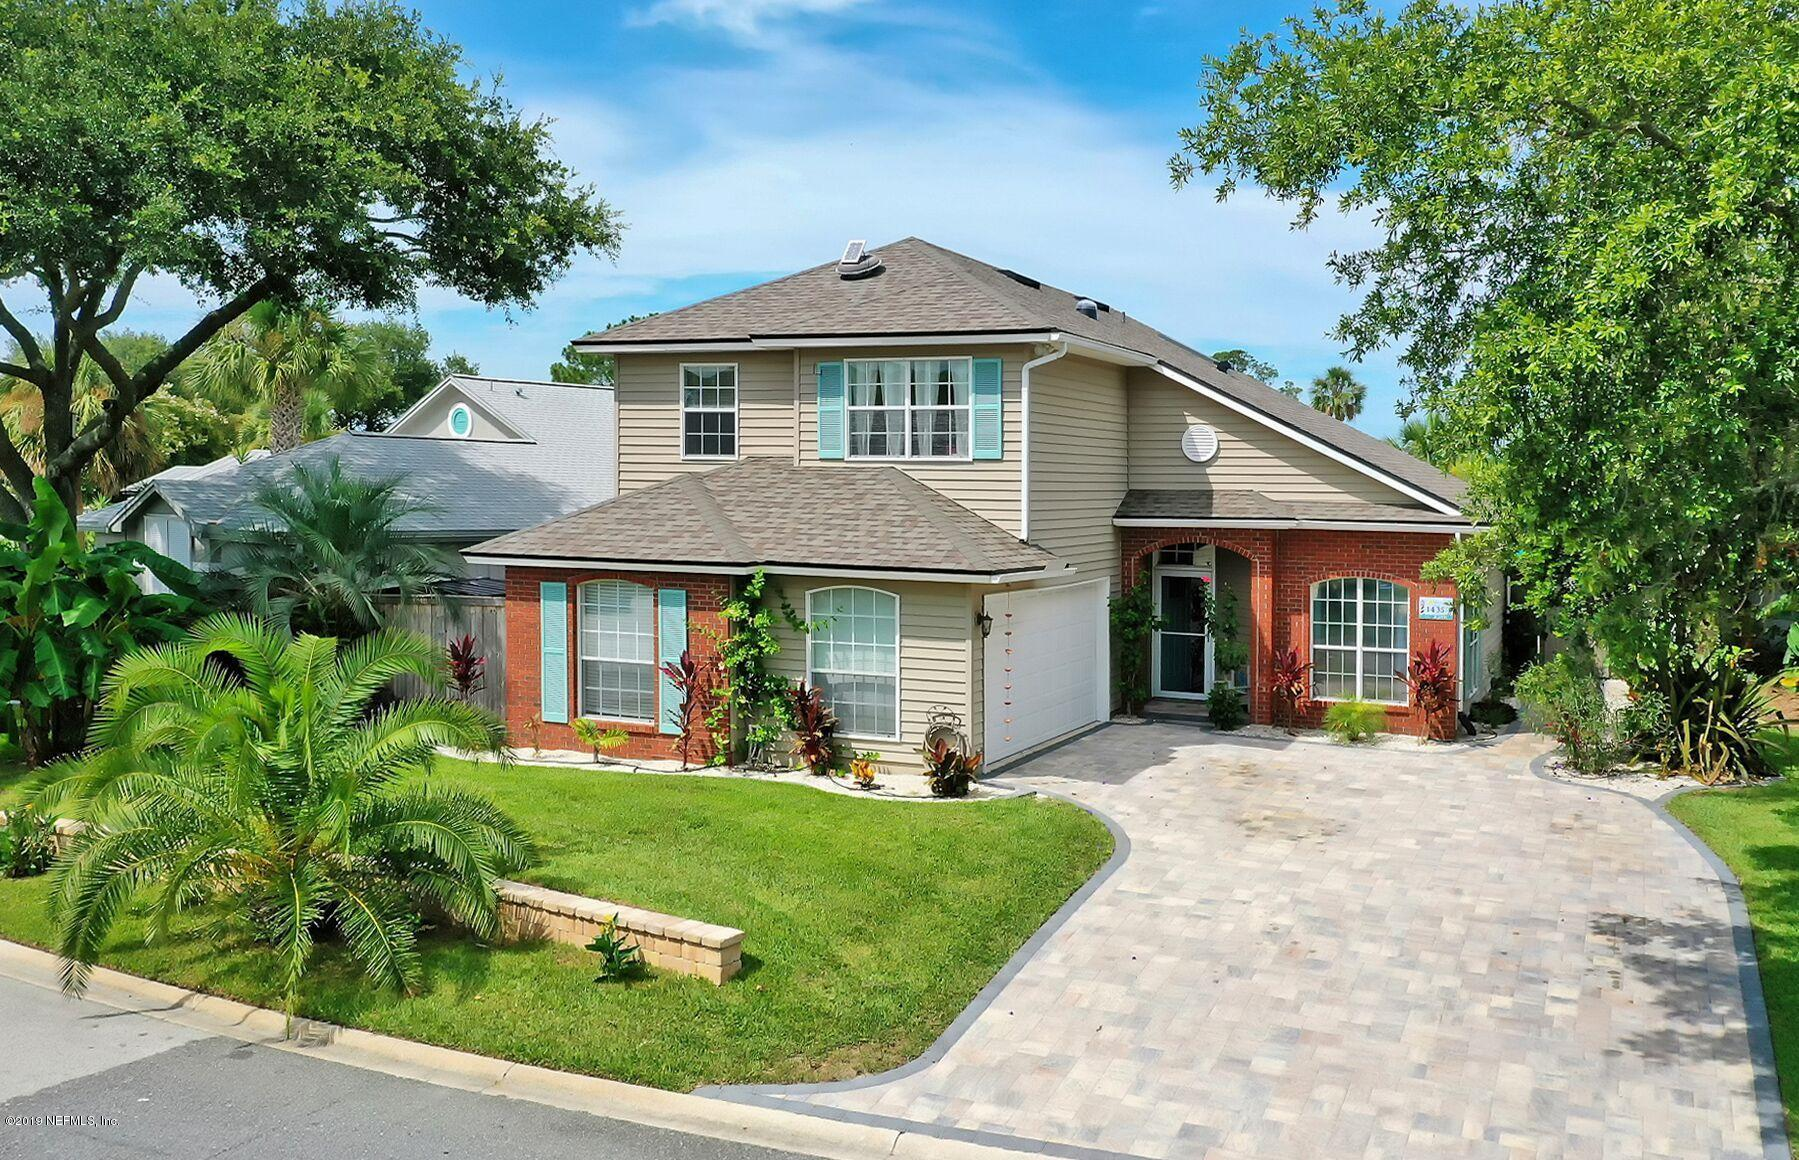 1435 LINKSIDE, ATLANTIC BEACH, FLORIDA 32233, 3 Bedrooms Bedrooms, ,2 BathroomsBathrooms,Residential - single family,For sale,LINKSIDE,1009231